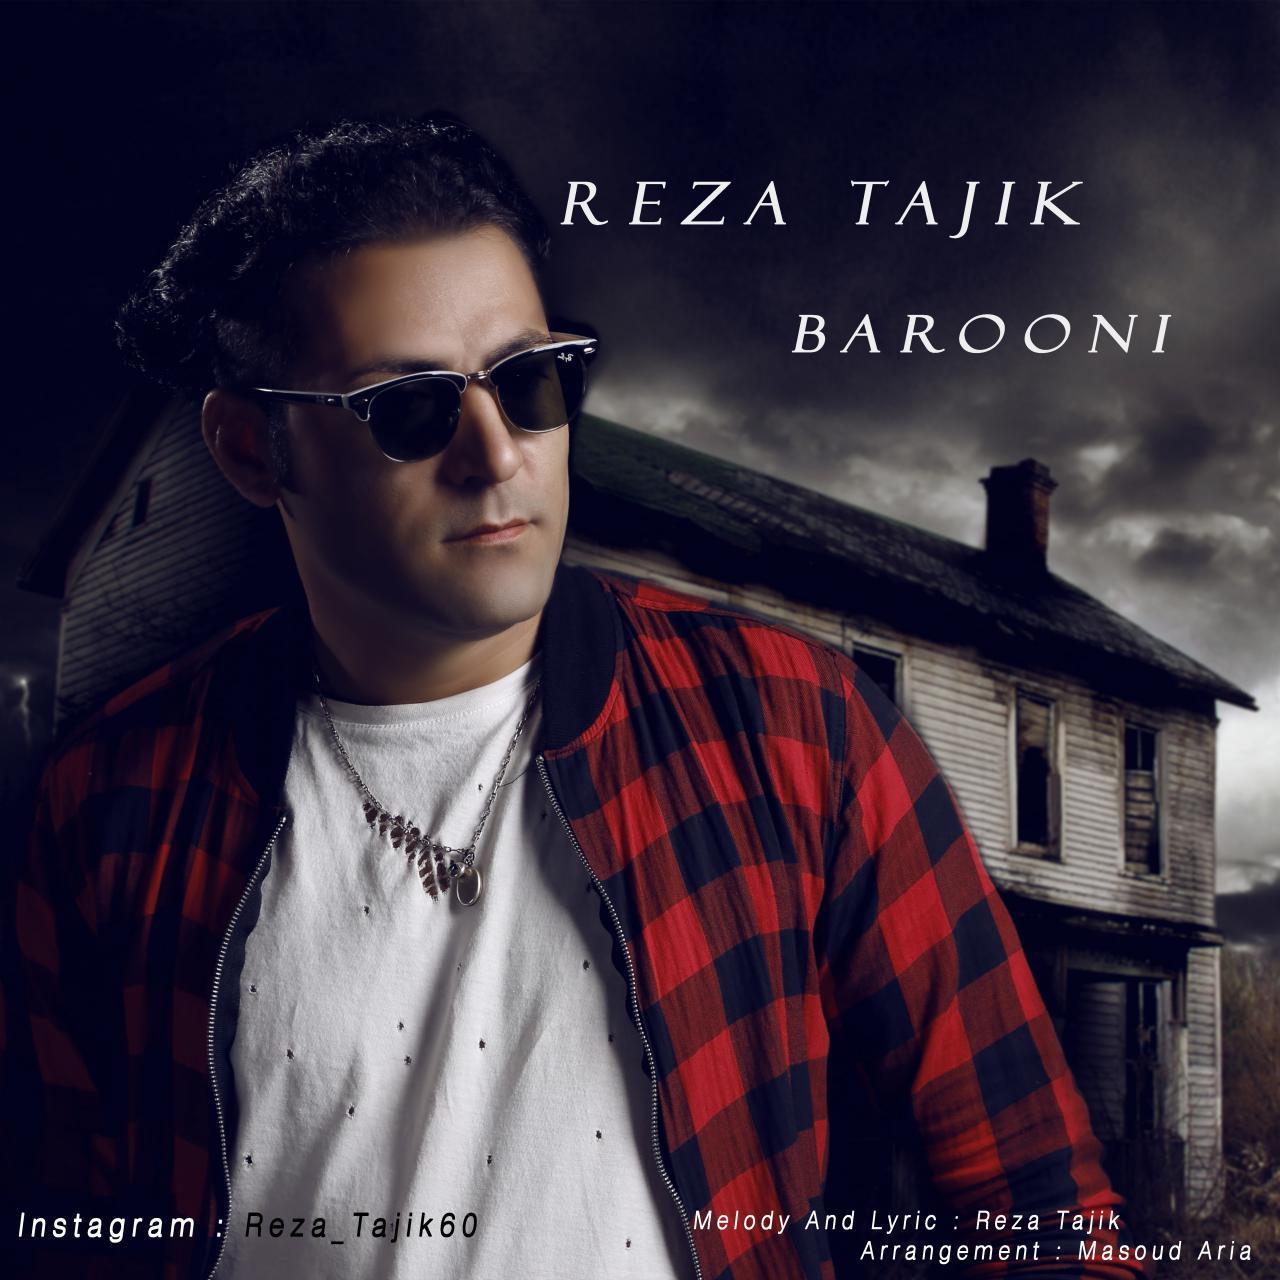 Reza Tajik – Barooni